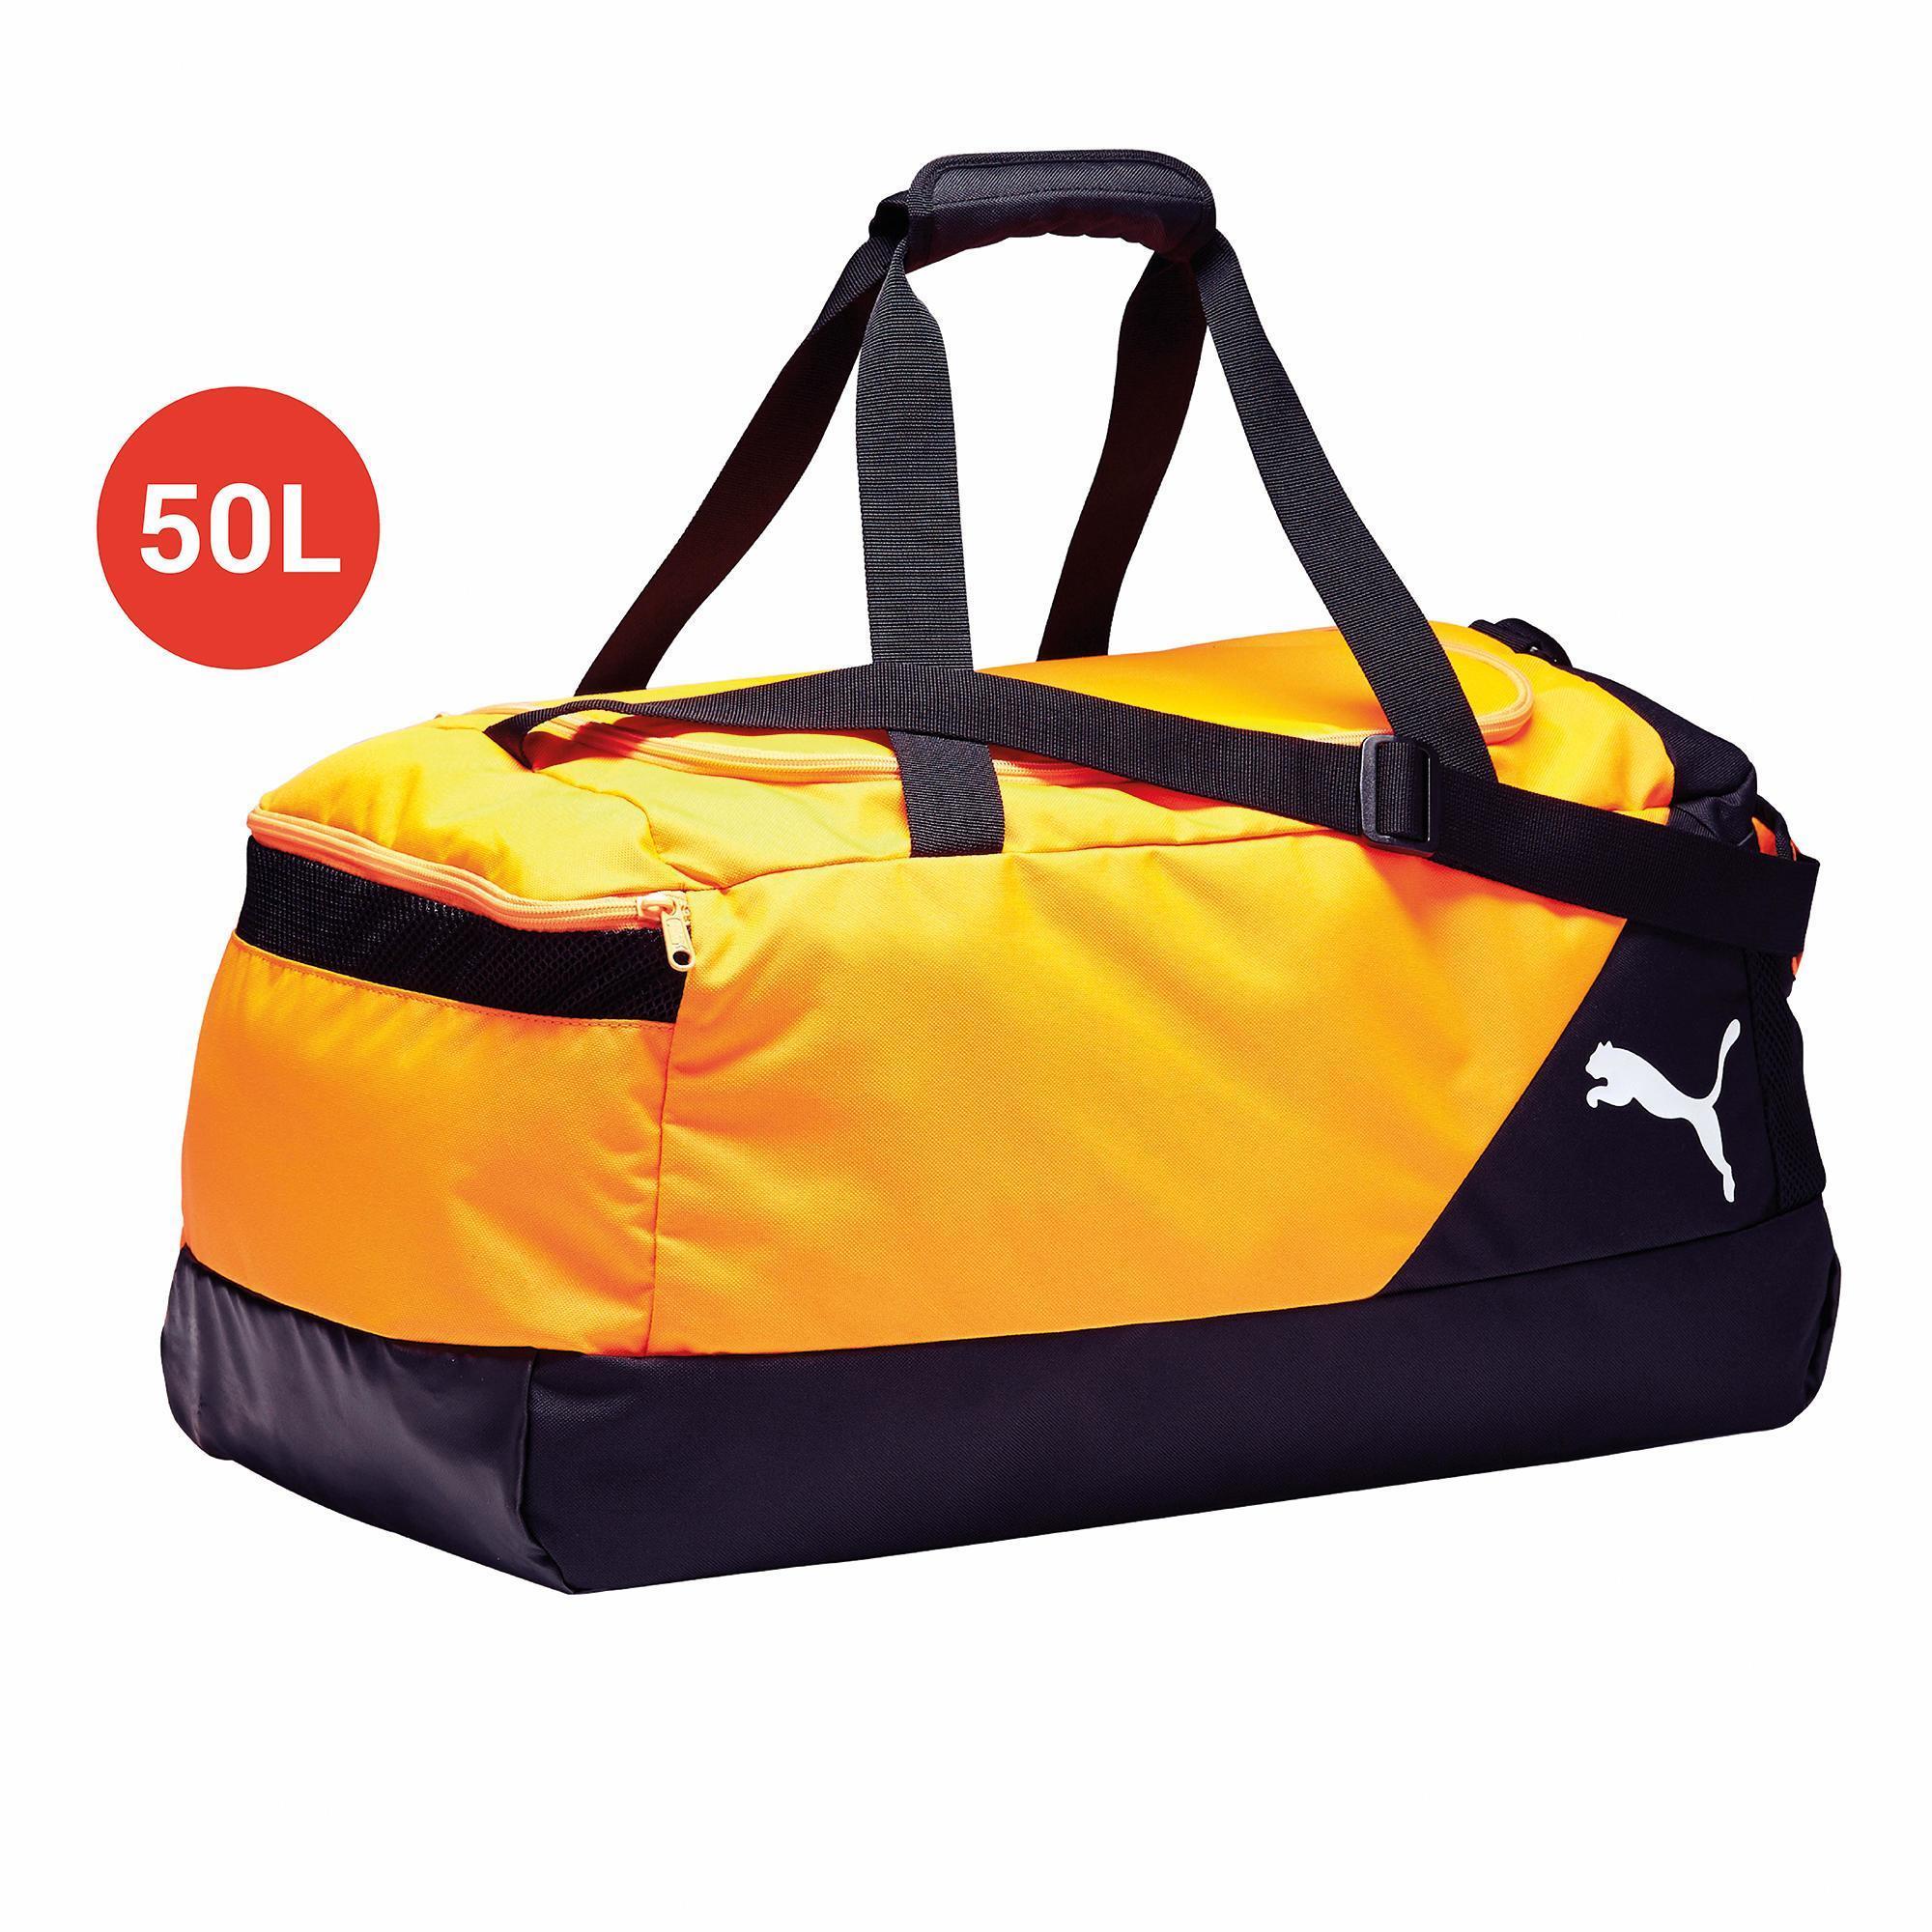 Puma Voetbaltas-Sporttas Protrain Medium bag 50 liter geel